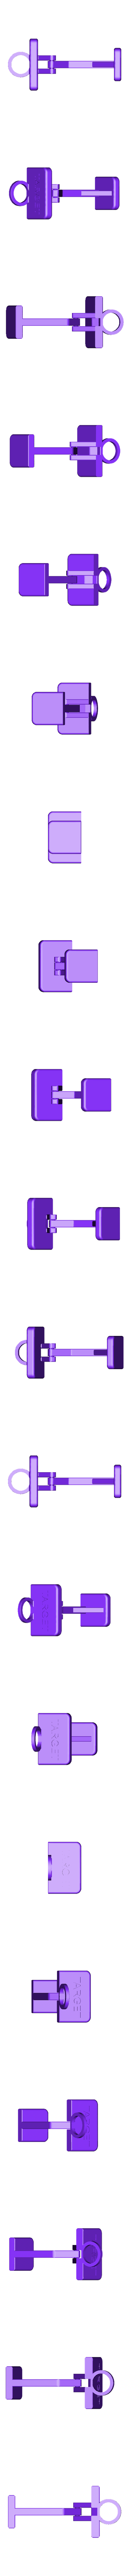 BasketballHoop_C.stl Download free STL file Basketball Hoop Stand, All in One • 3D print object, LGBU